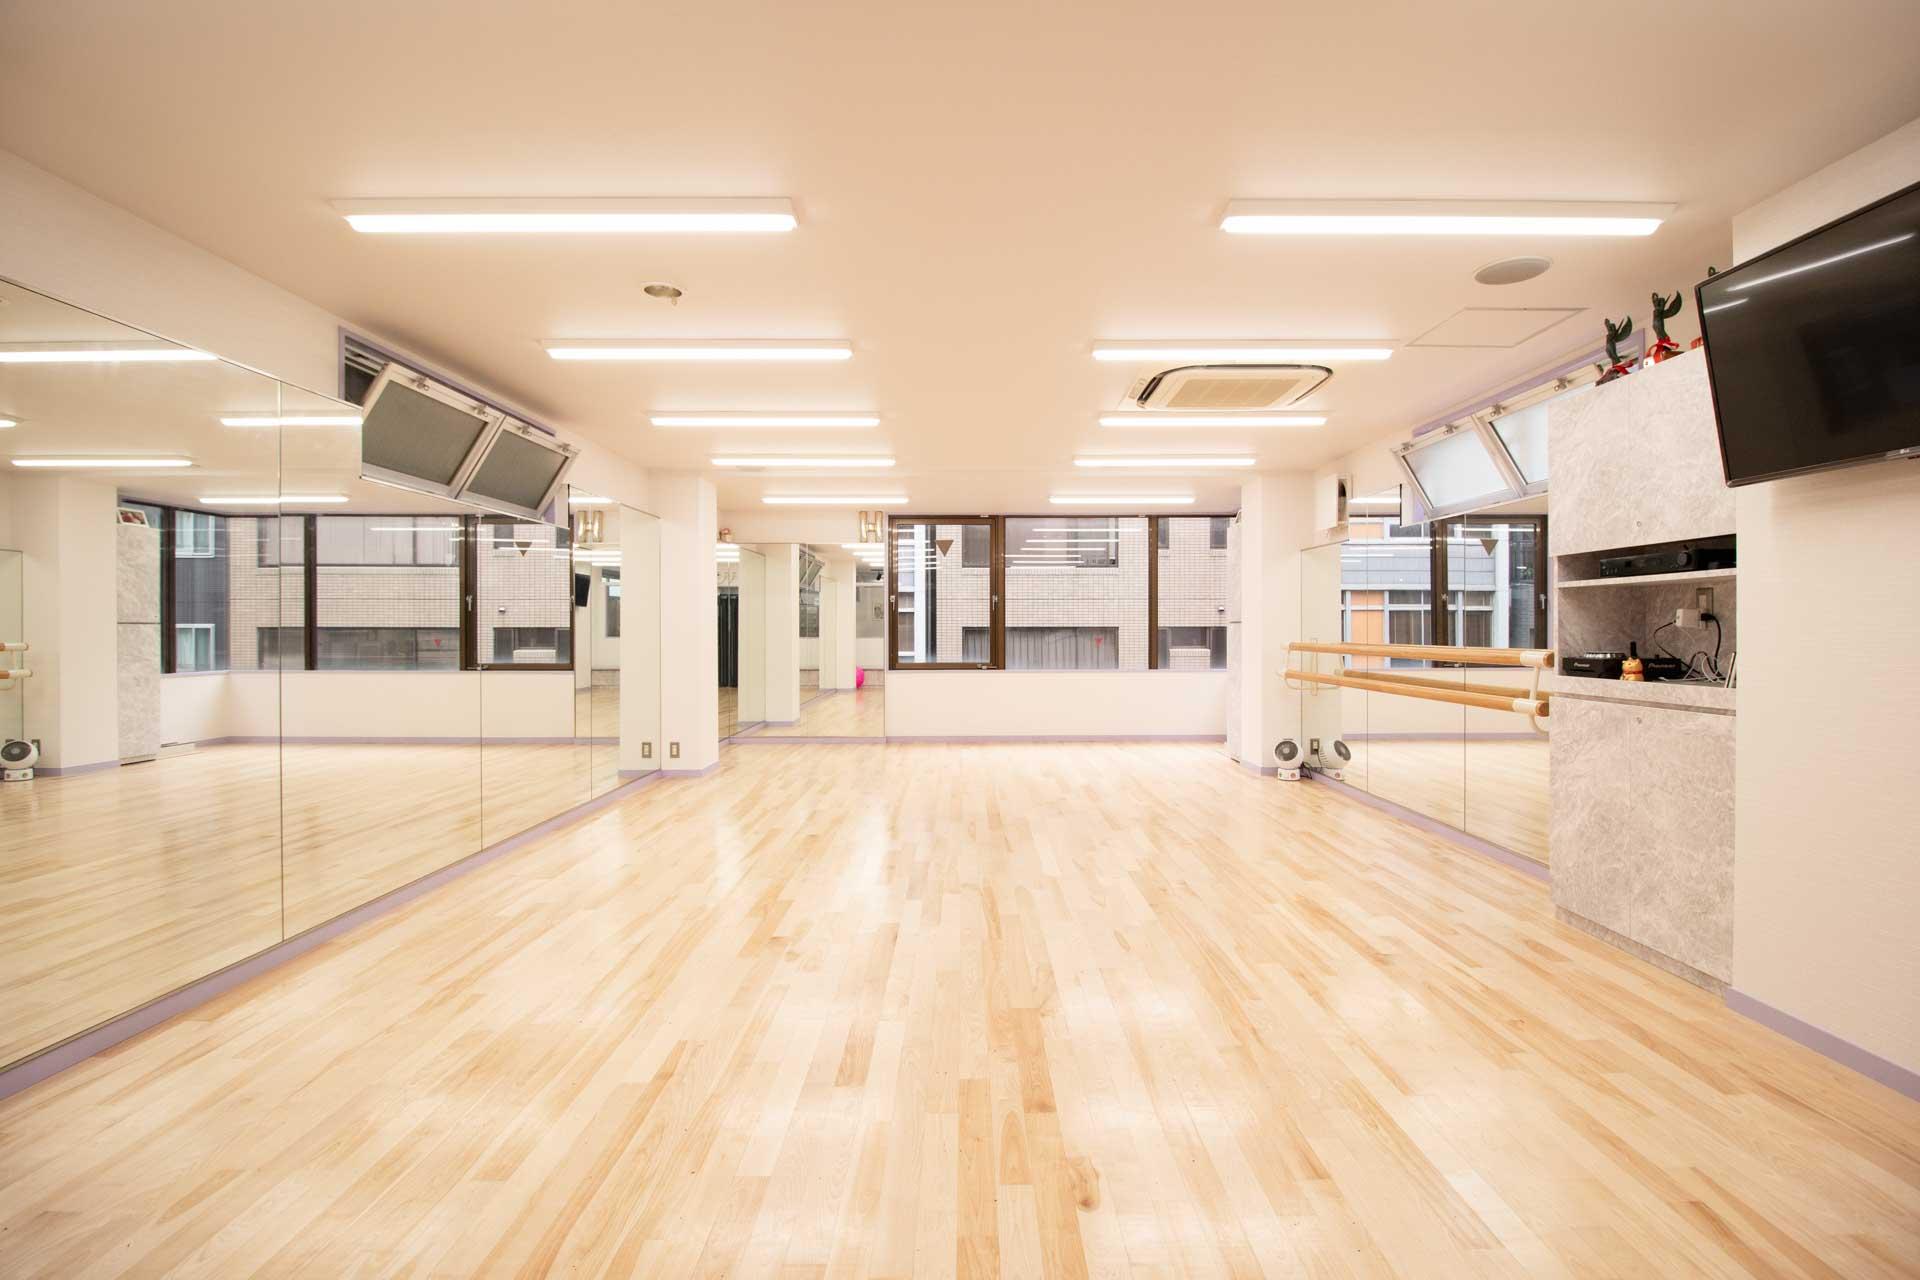 Ballroom Dance Style HASHIMOTOアイキャッチ画像 null